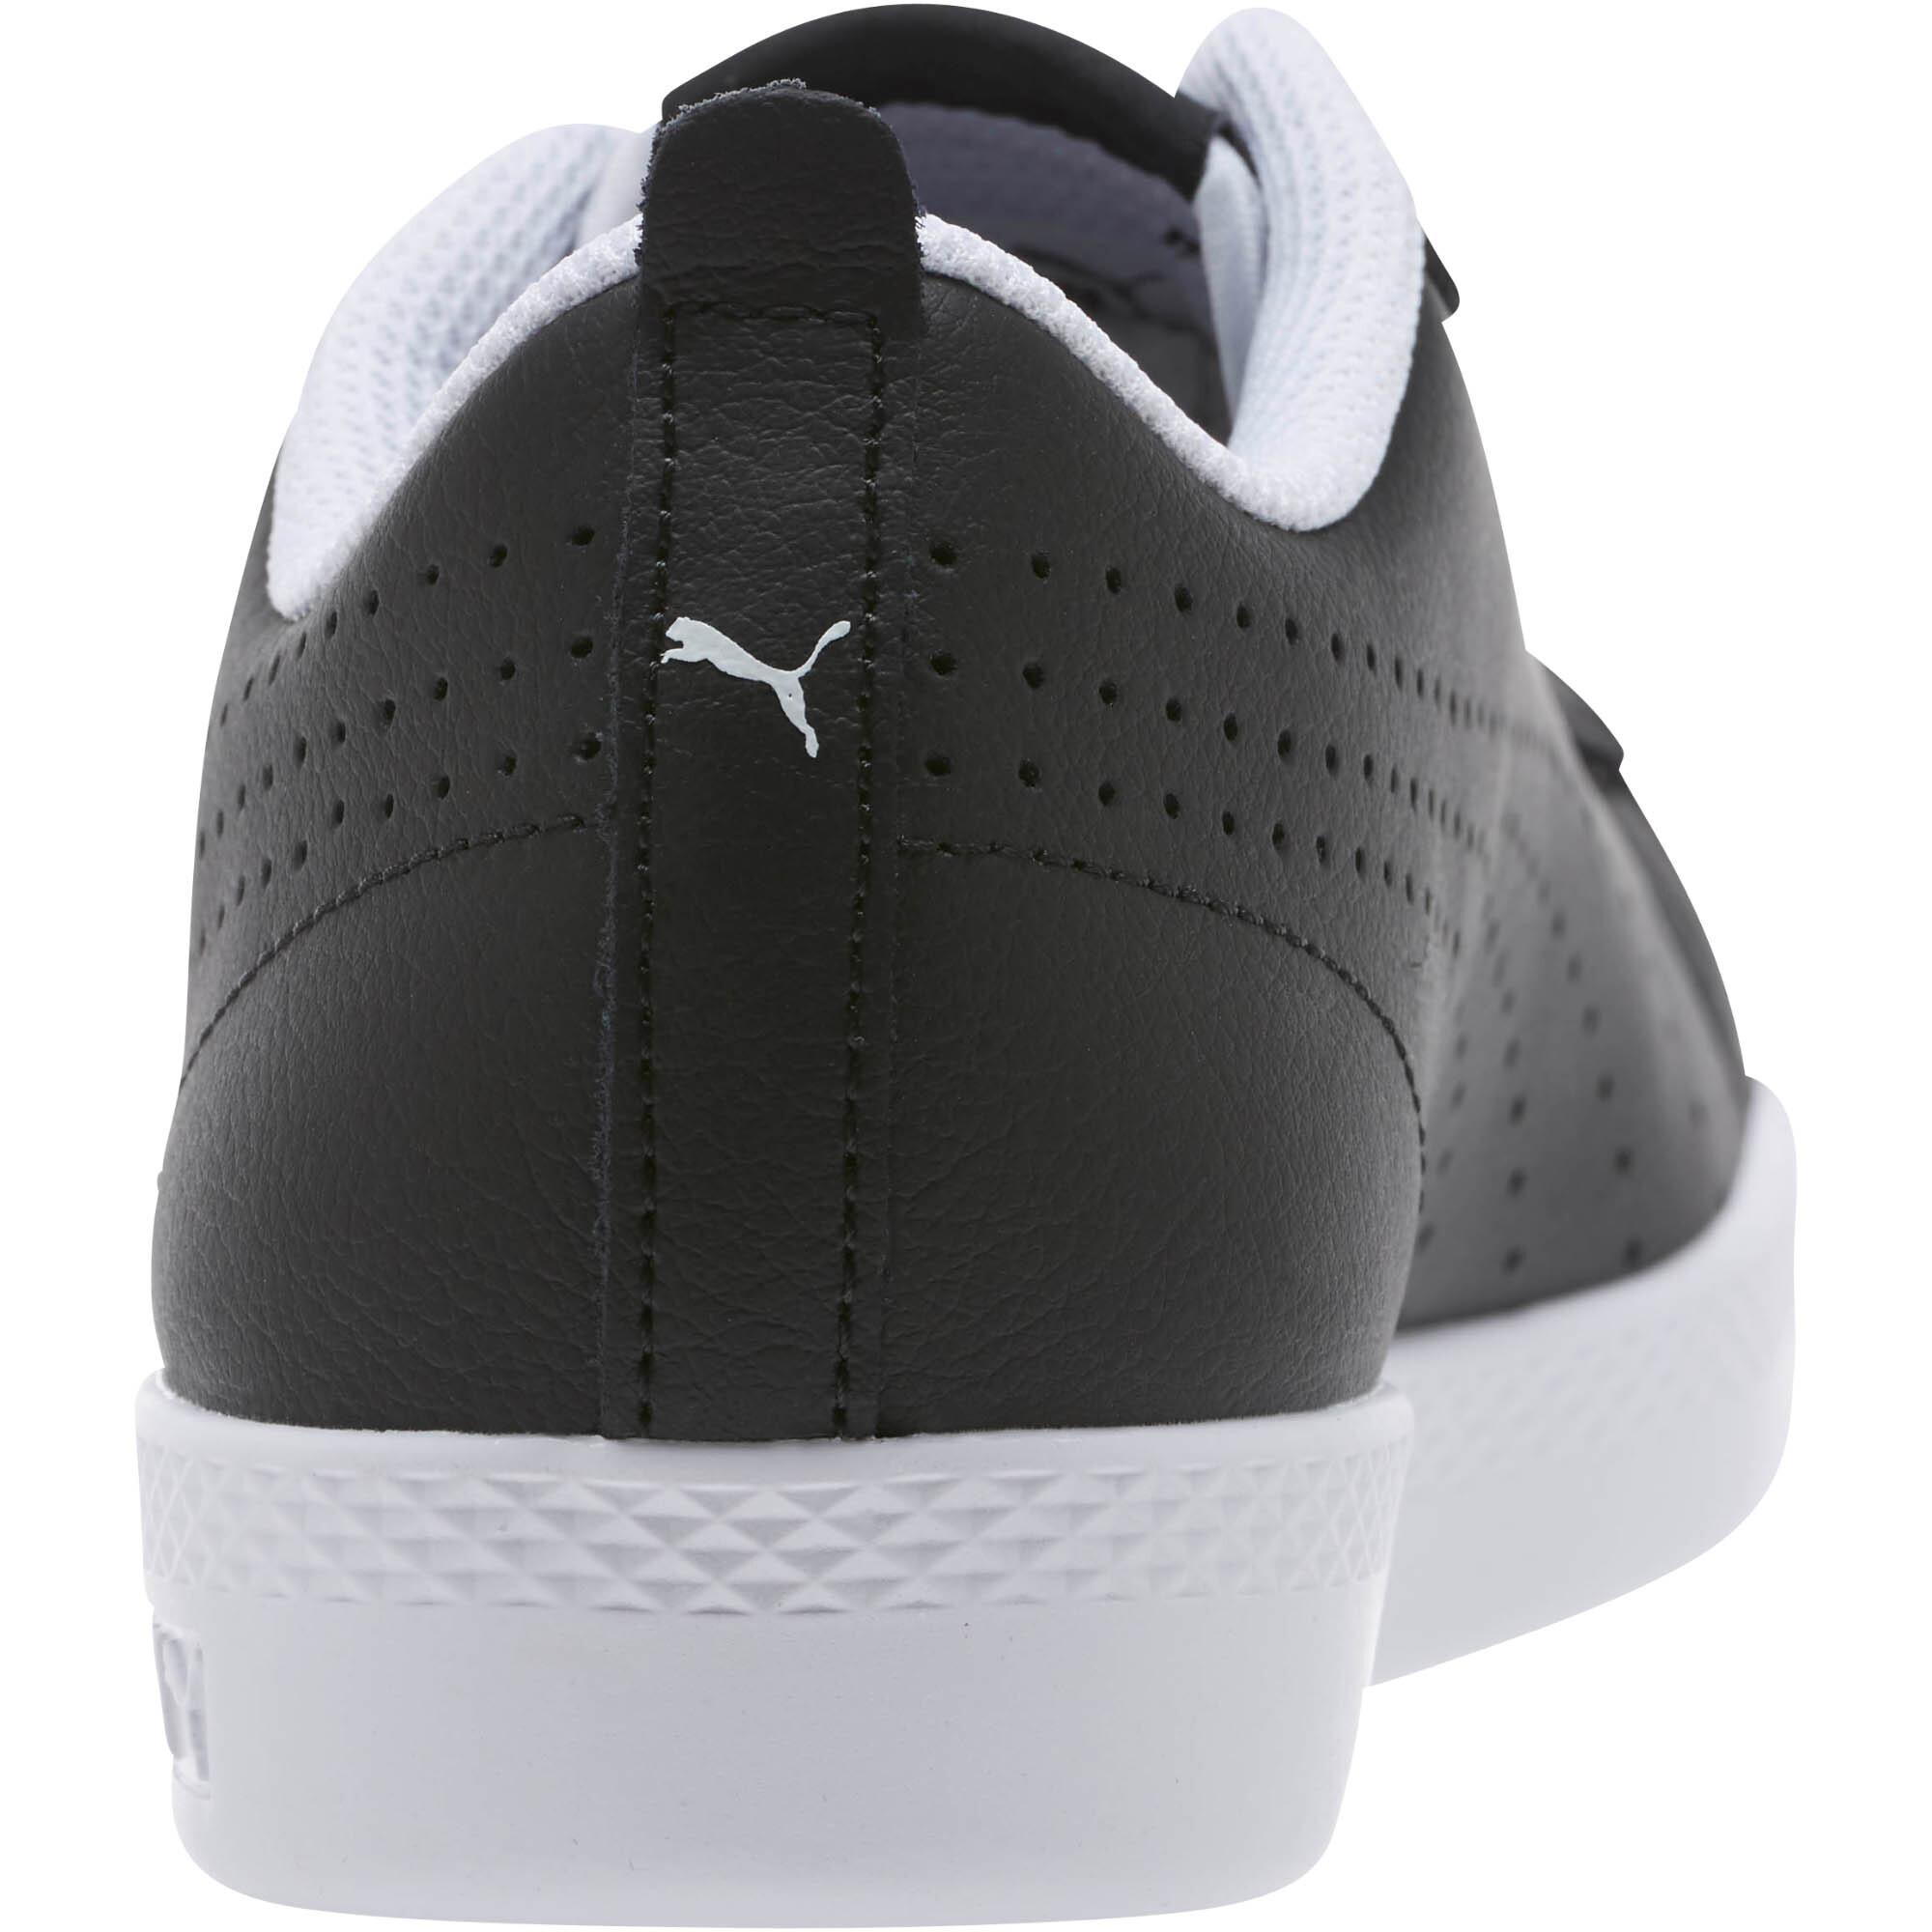 95830b15035 Details about PUMA Smash v2 Perf Women's Sneakers Women Shoe Basics